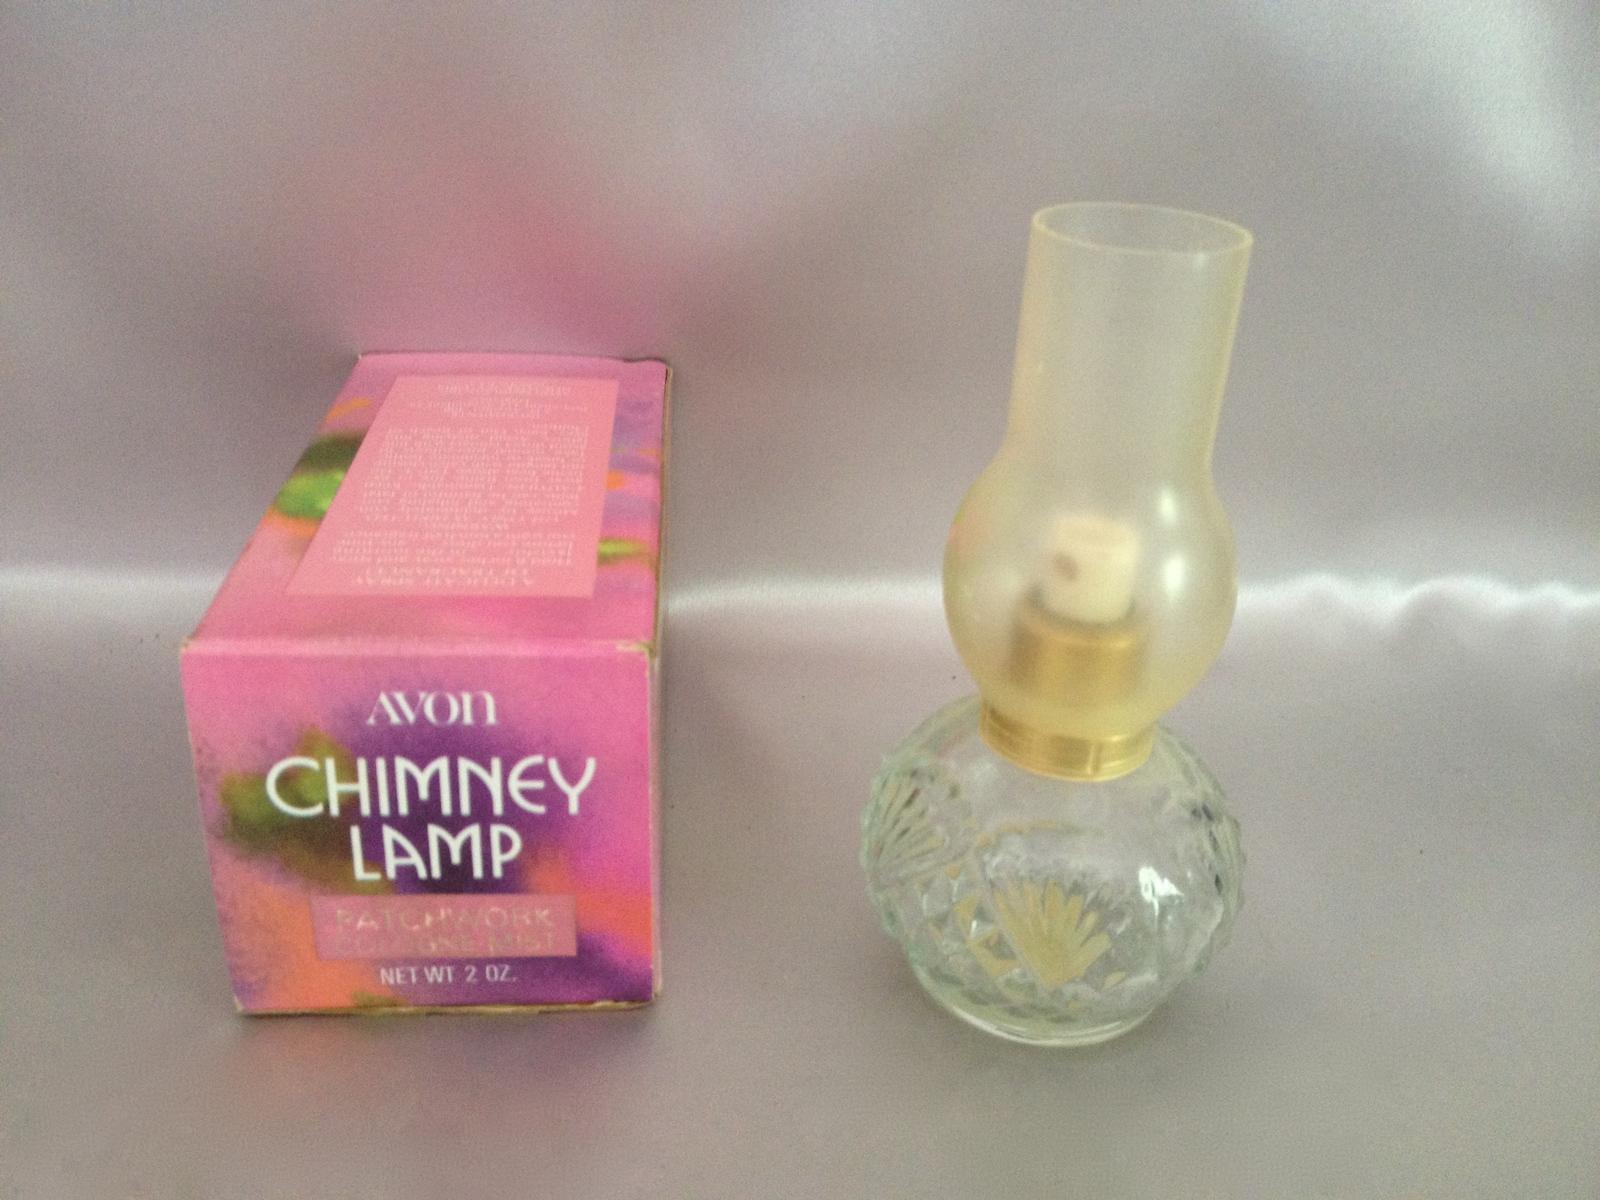 Avon Chimney Lamp Patchwork Cologne Mist Empty Mini Vintage Collectible